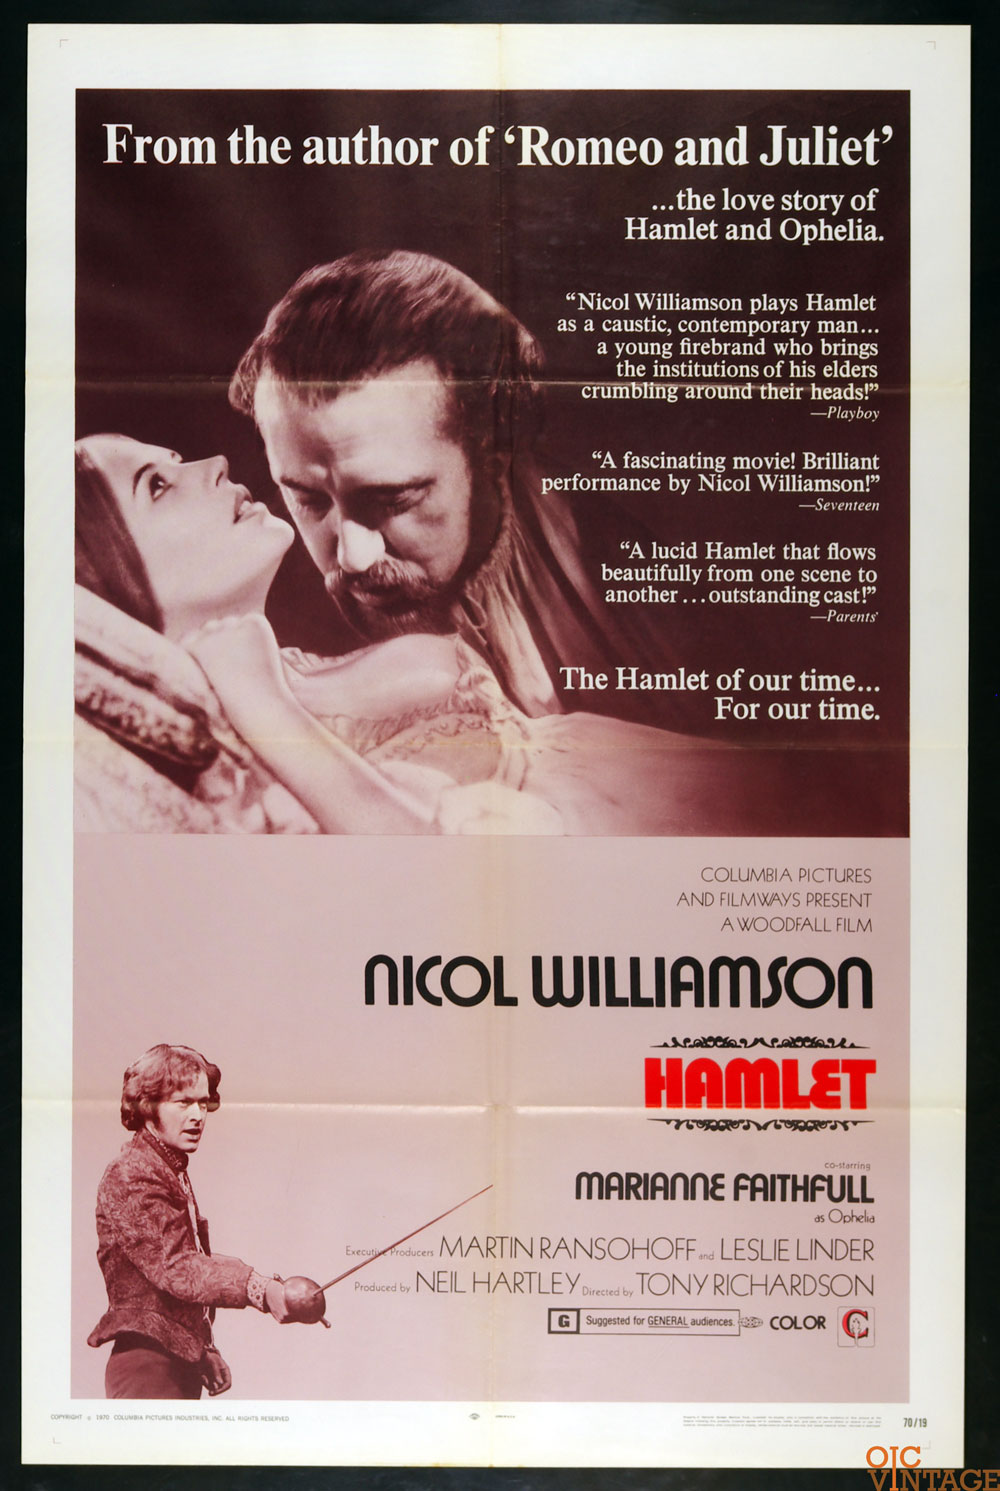 Hamlet Movie Poster 1970 Nicol Williamson  27x41 1 Sheet